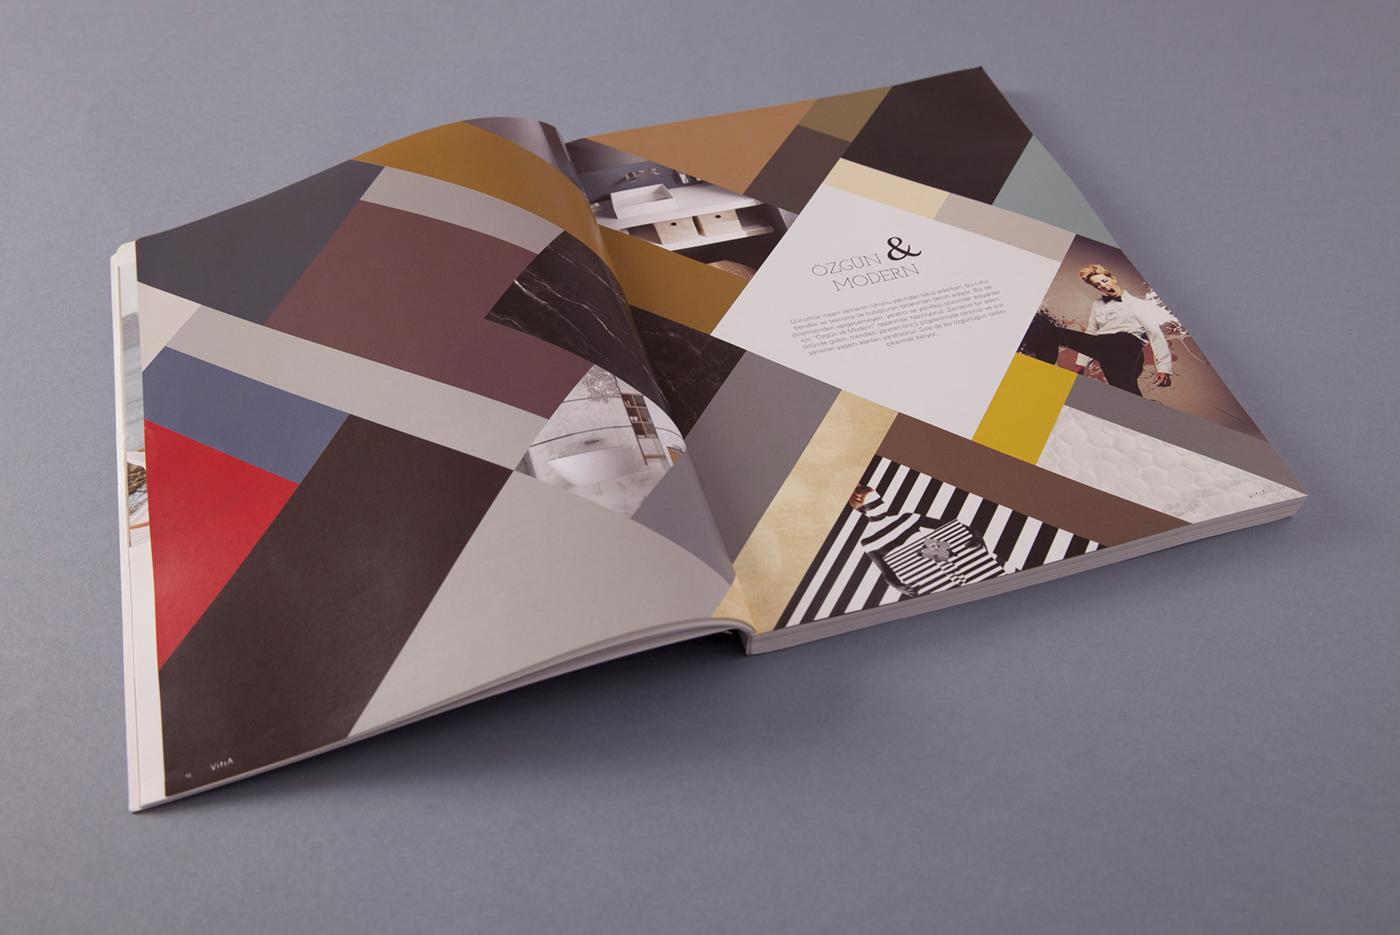 VitrA Bathroom/Tiles catalogue 2016 on Behance